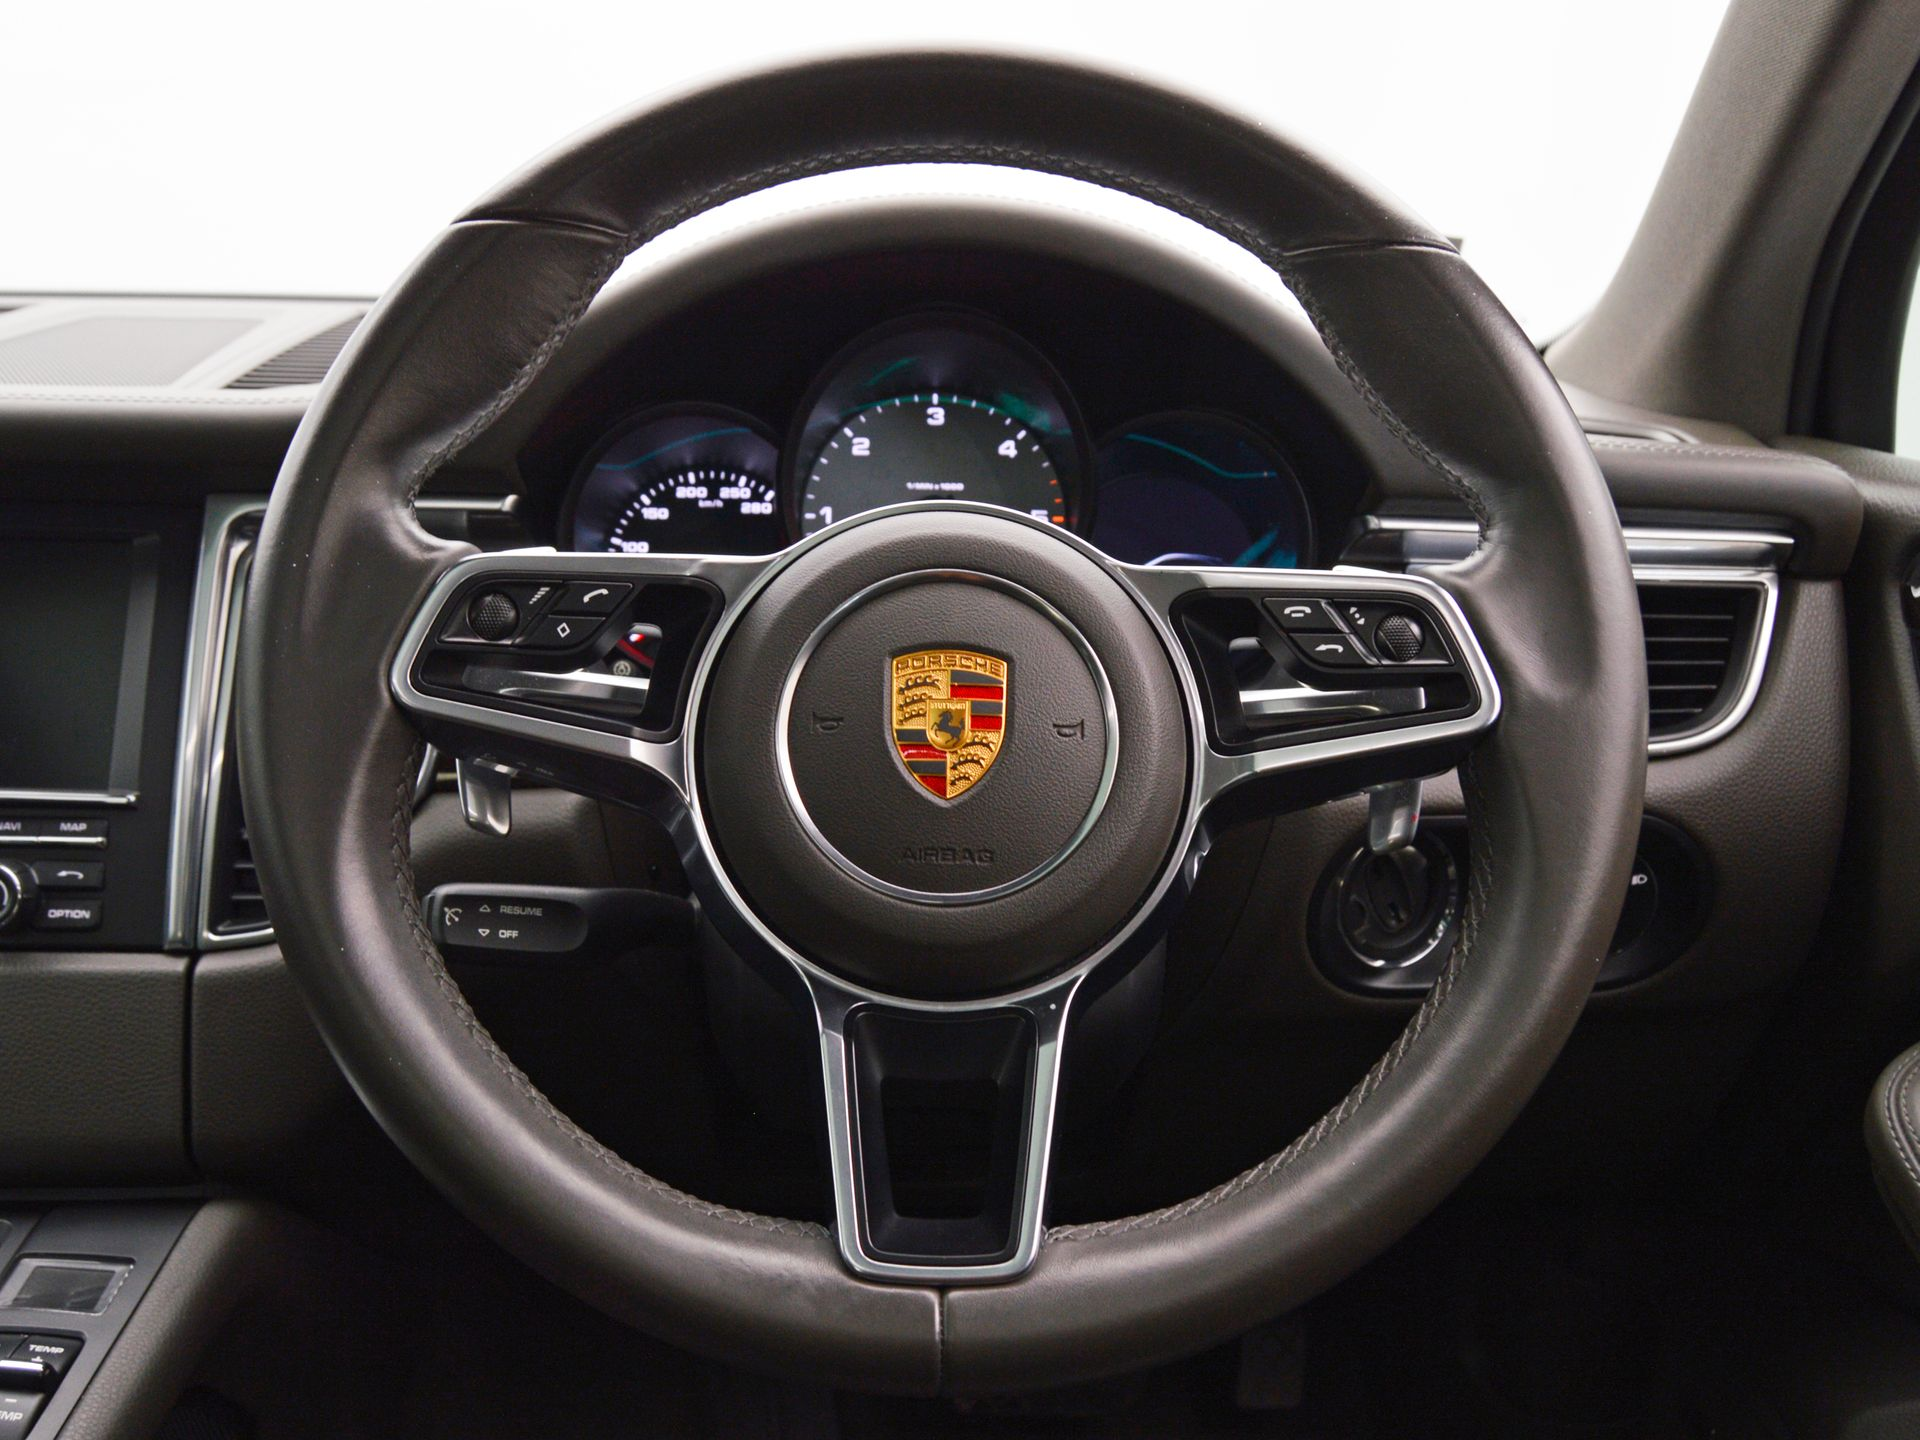 2016 Porsche Macan S Diesel (180 KW) – 4